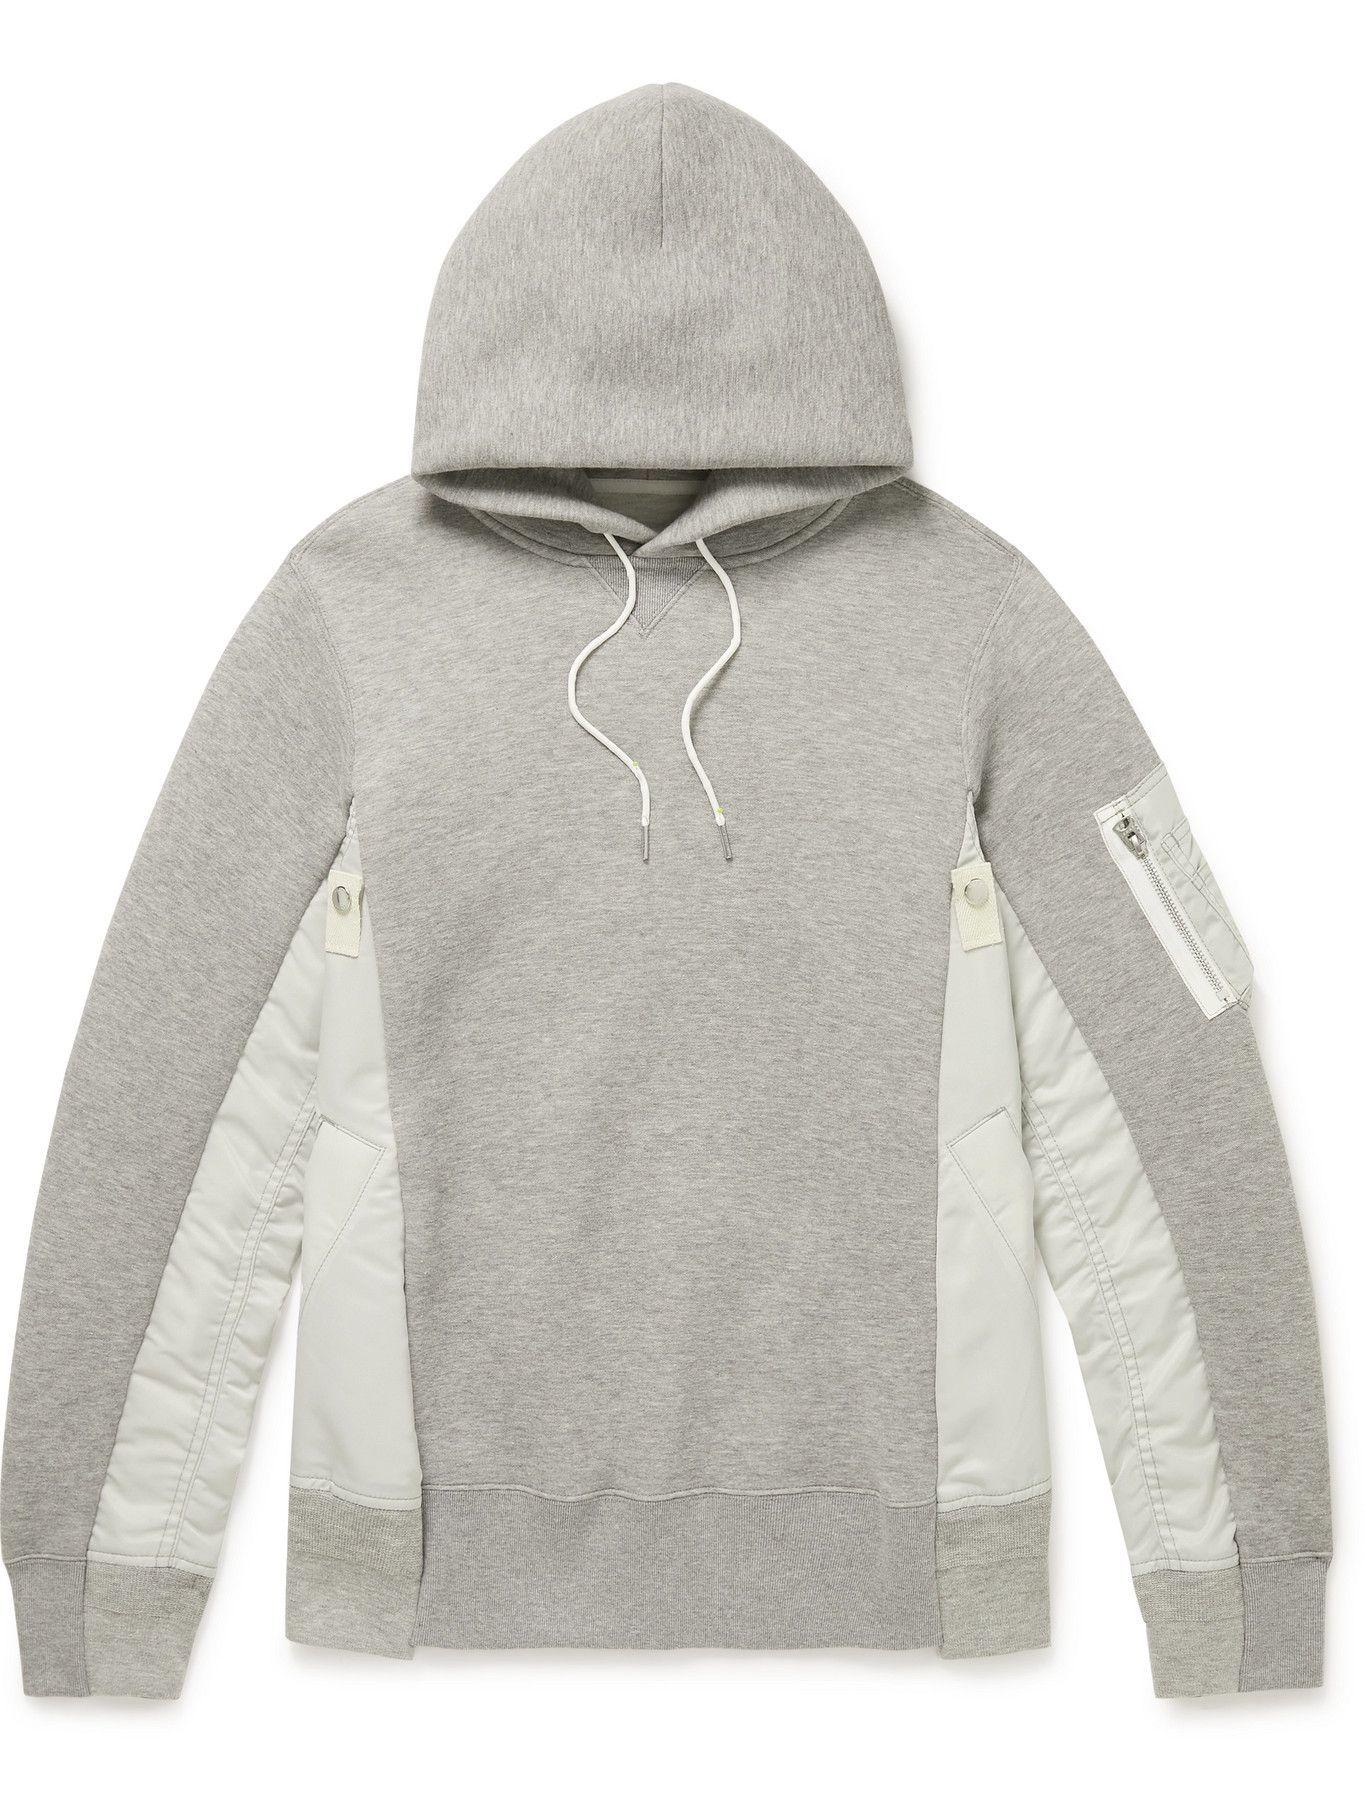 Photo: Sacai - Nylon-Trimmed Cotton-Blend Jersey Hoodie - Gray